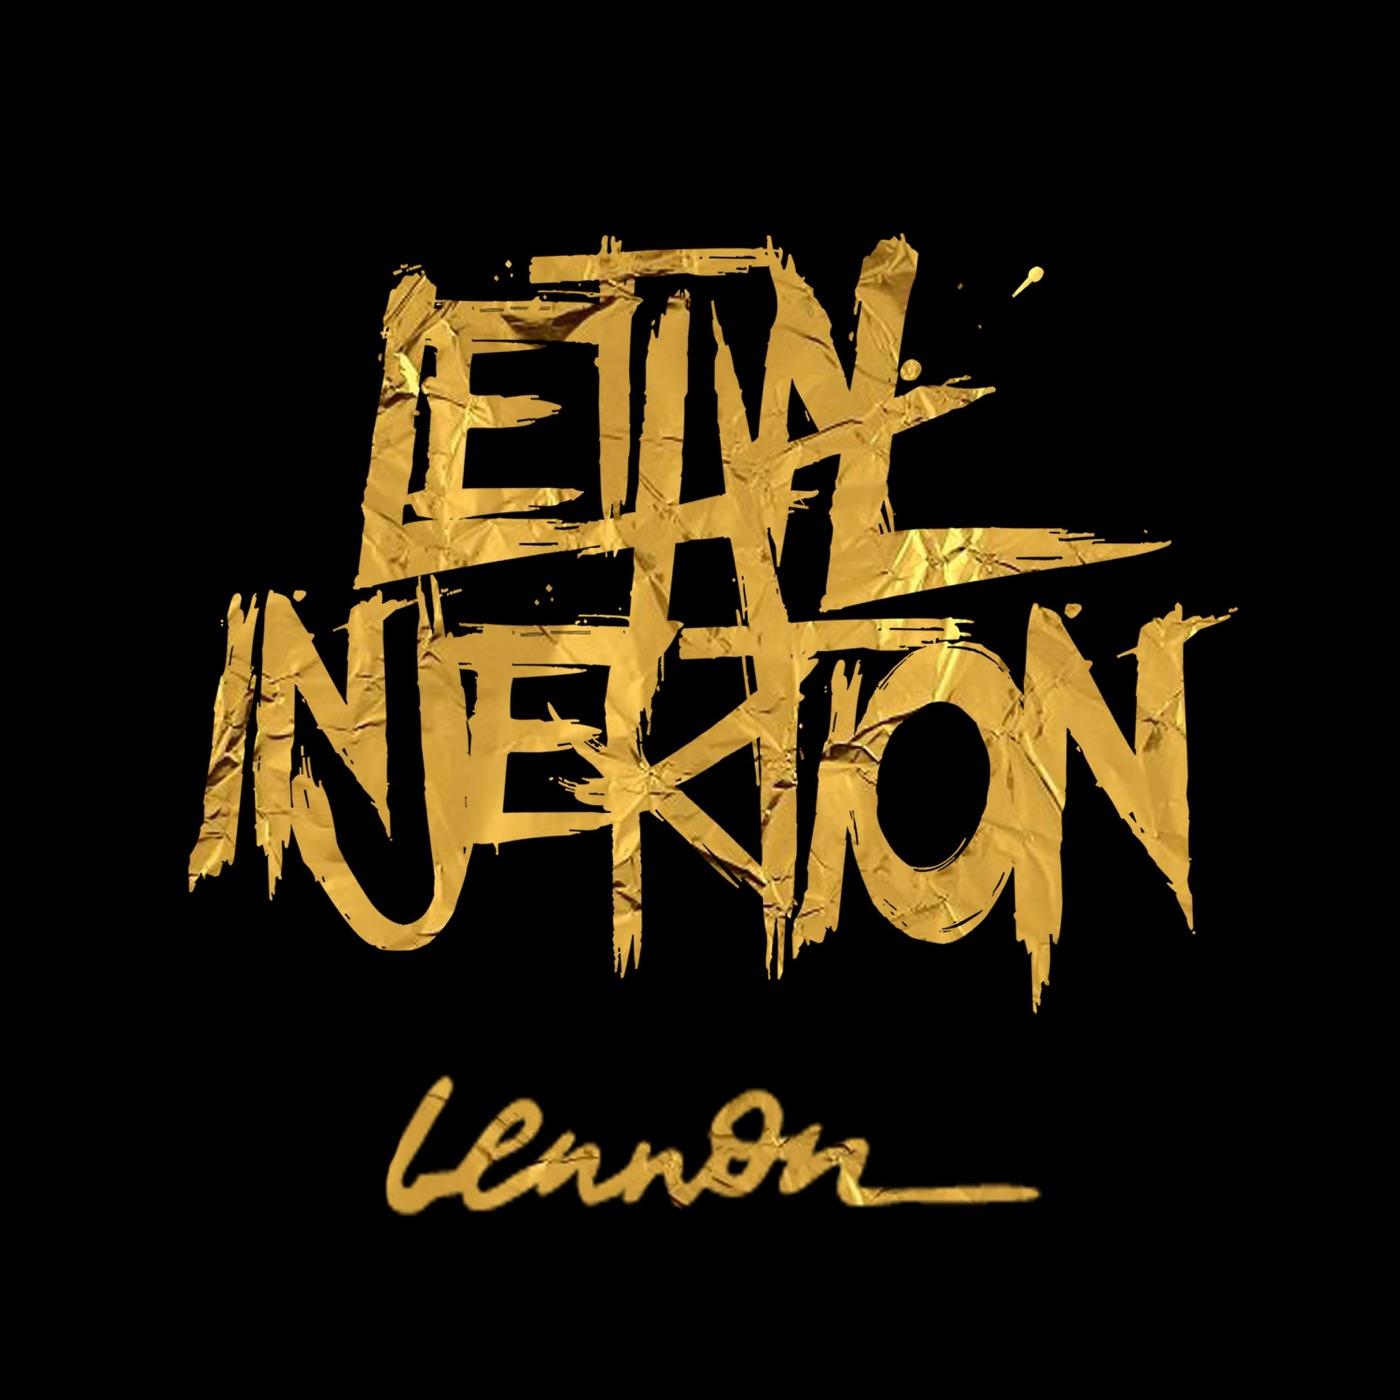 Lethal Injektion - Lennon [single] (2020)